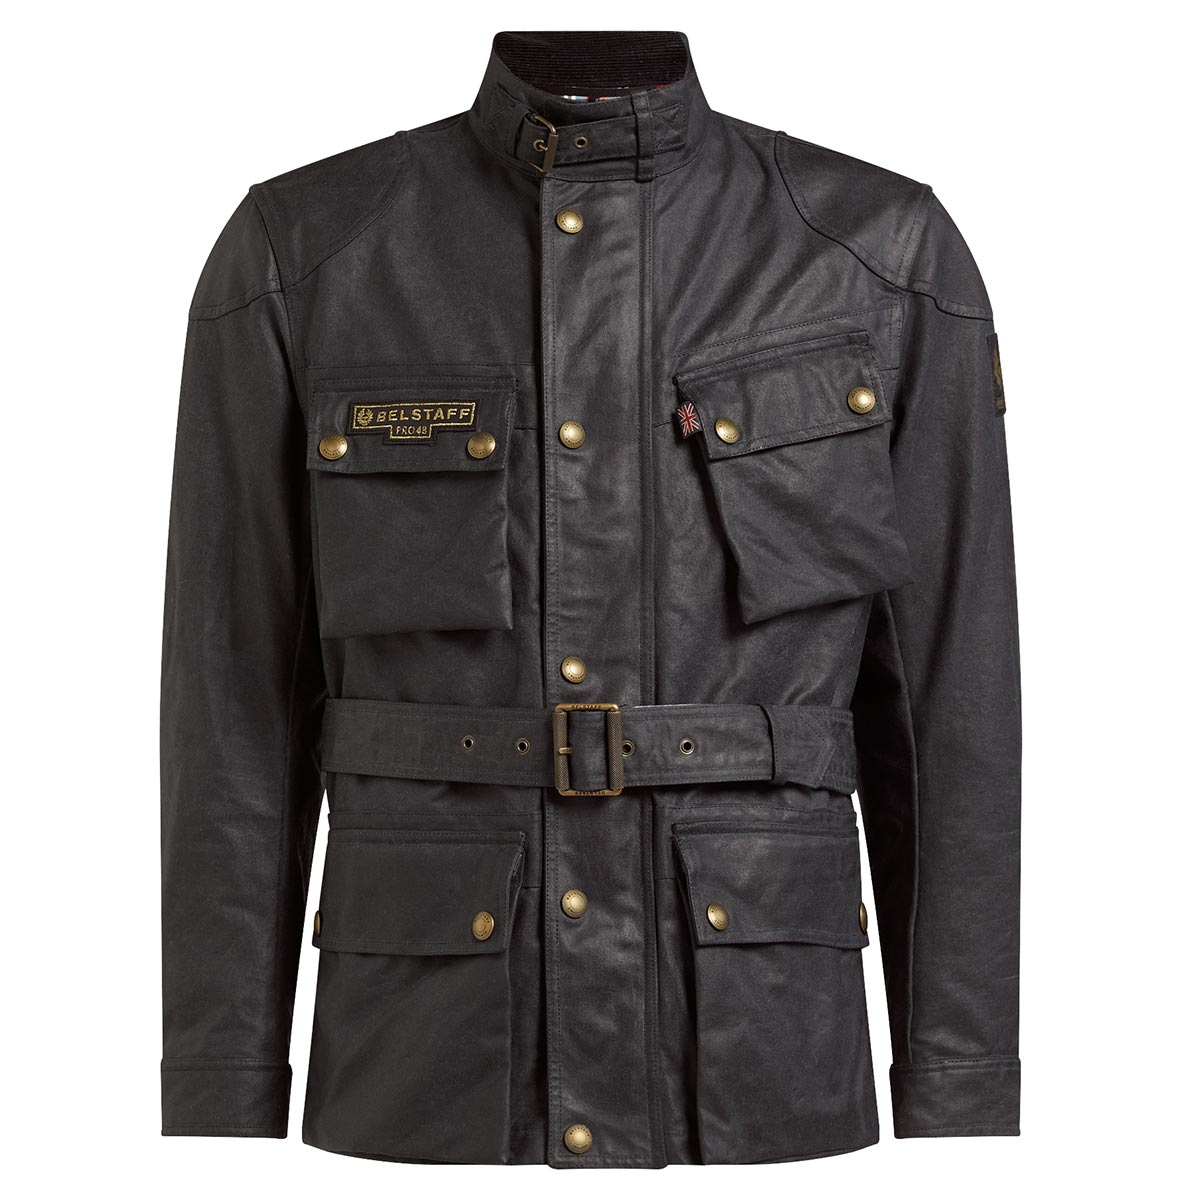 Belstaff Trialmaster Pro48 Waxed Cotton Jacket - Vintage Black